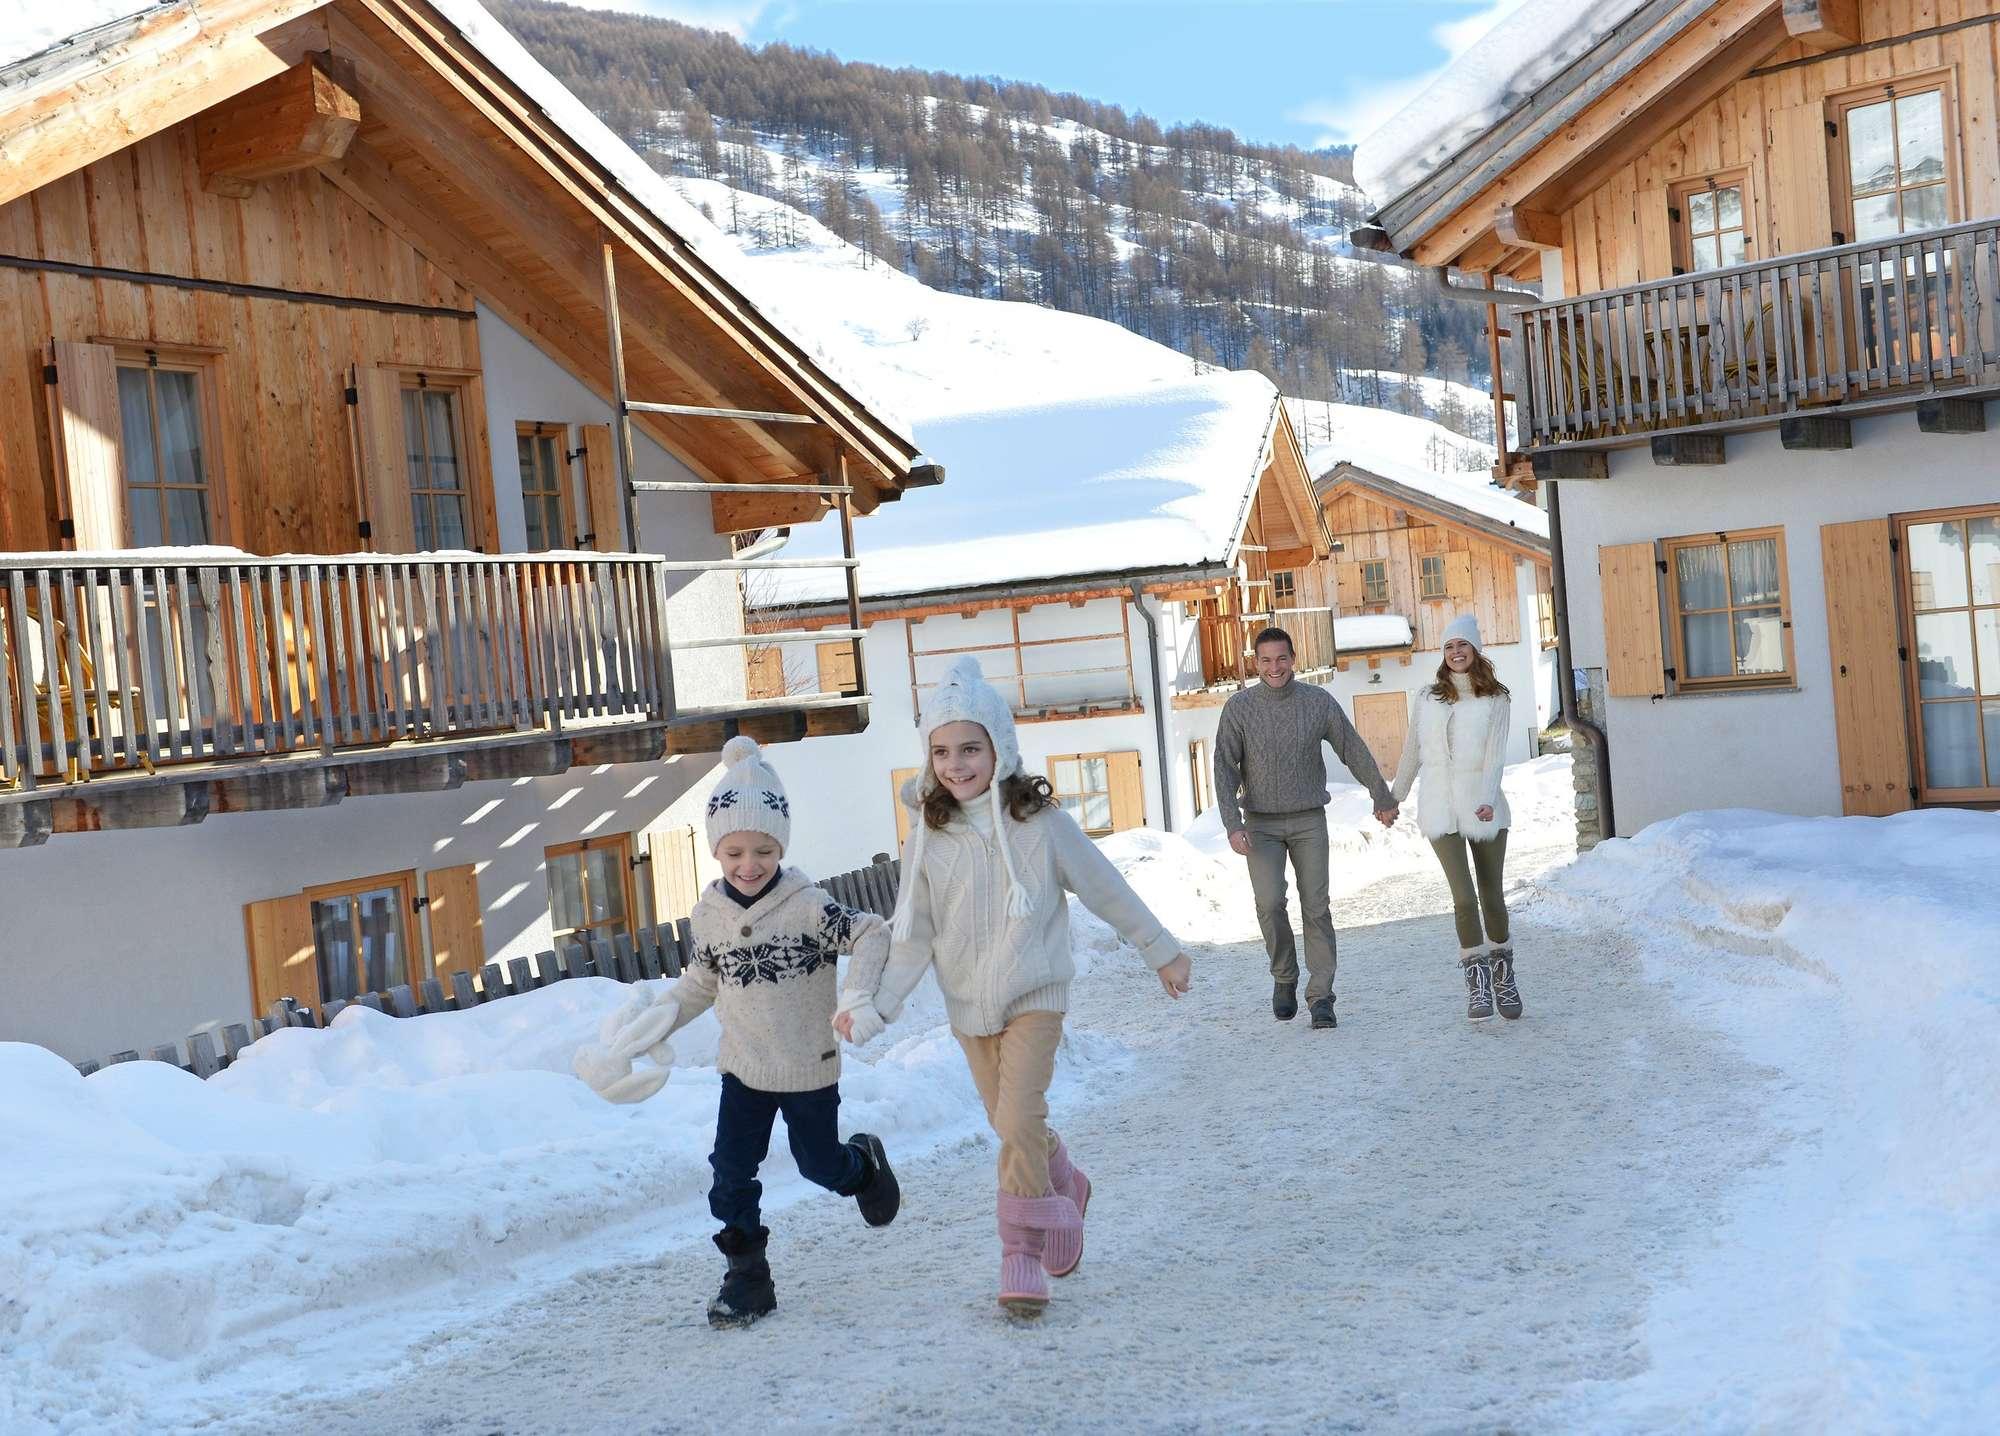 Resort Club Med de Pragelato Vialattea. Foto retirada do site.